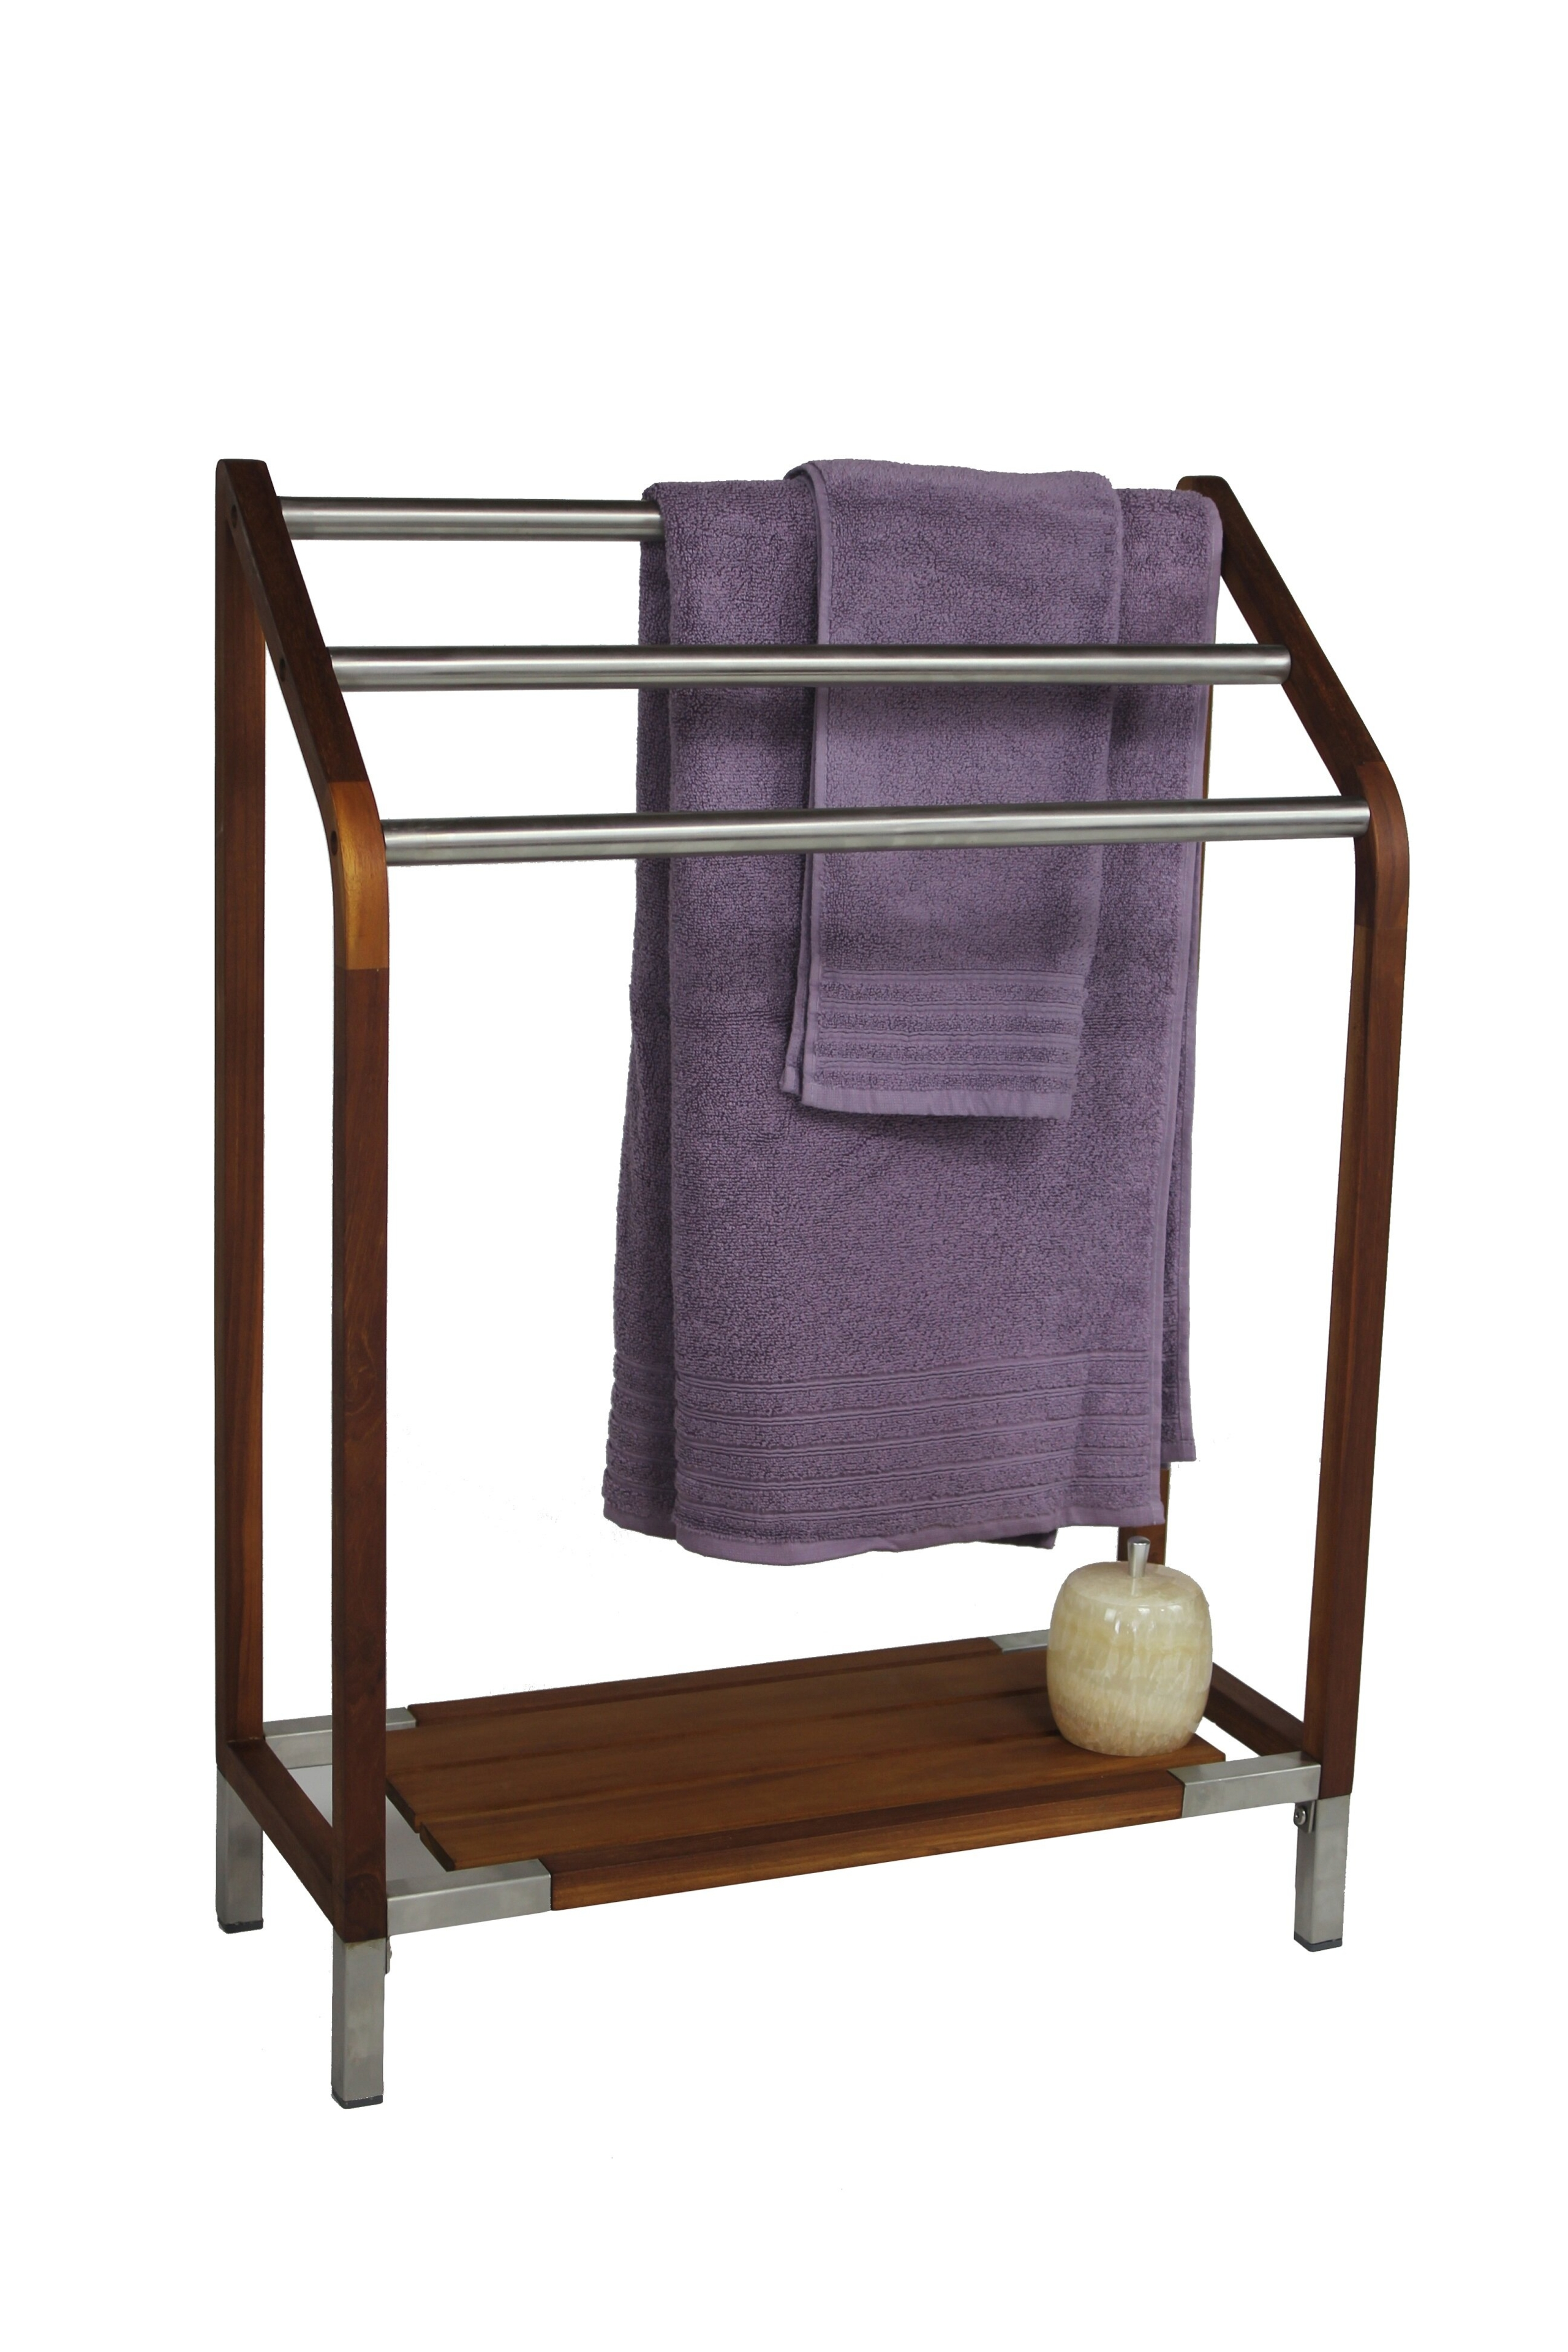 teak towel stand ideas on foter